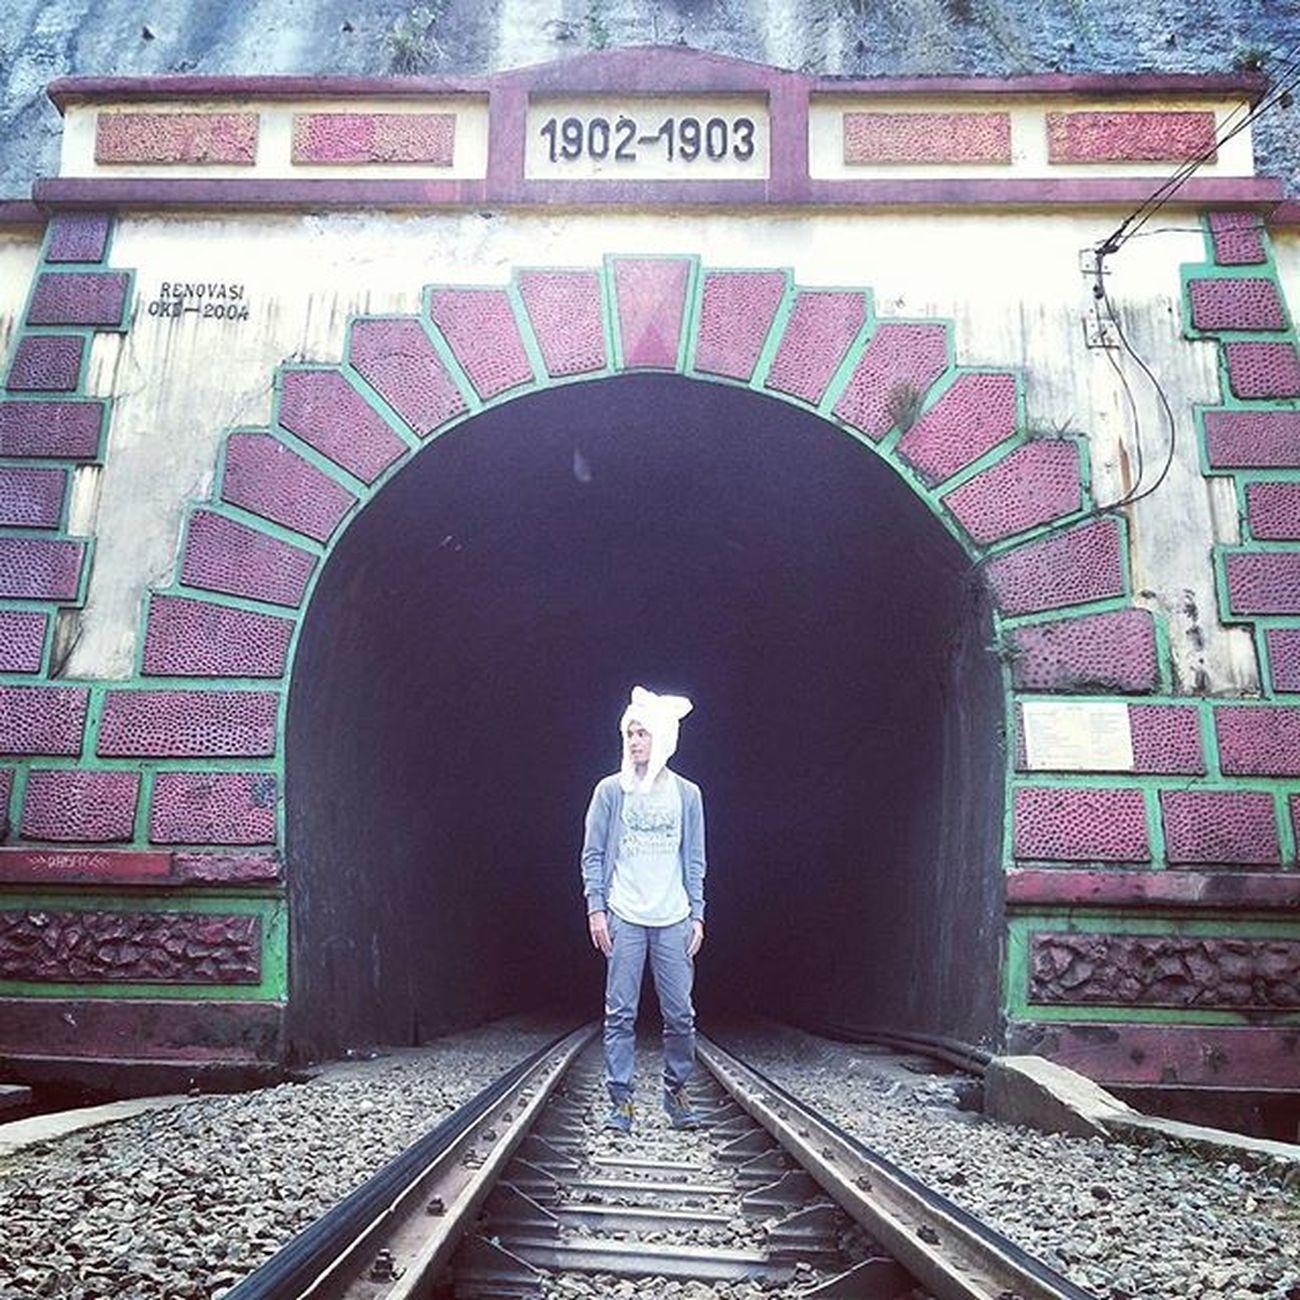 Jarambah Edisi : Urban Legend Jogger pants by : @BusanaArshop Terowongan kereta ini merupakan salah satu terowongan terpanjang yg ada di Indonesia, lalu lintasnya pun cukup padat. Saking padatnya sehingga dibangun pos penjaga di kedua ujung terowongannya. Terowongan ini pun cukup terkenal dg keangkerannya. Setiap 17 agustus warga sekitar selalu memberi sesajen sbg usaha penolak bala. Mitosnya, para pekerja rodi yg mati saat membangun terowongan ini jasadnya dikubur dan dijadikan benteng sekitar terowongan ini.. Lokasi : Terowongan Sasaksaat, Padalarang . Ridwanderful JarambahBandung DiBawahLangitBandung BandungIsMe